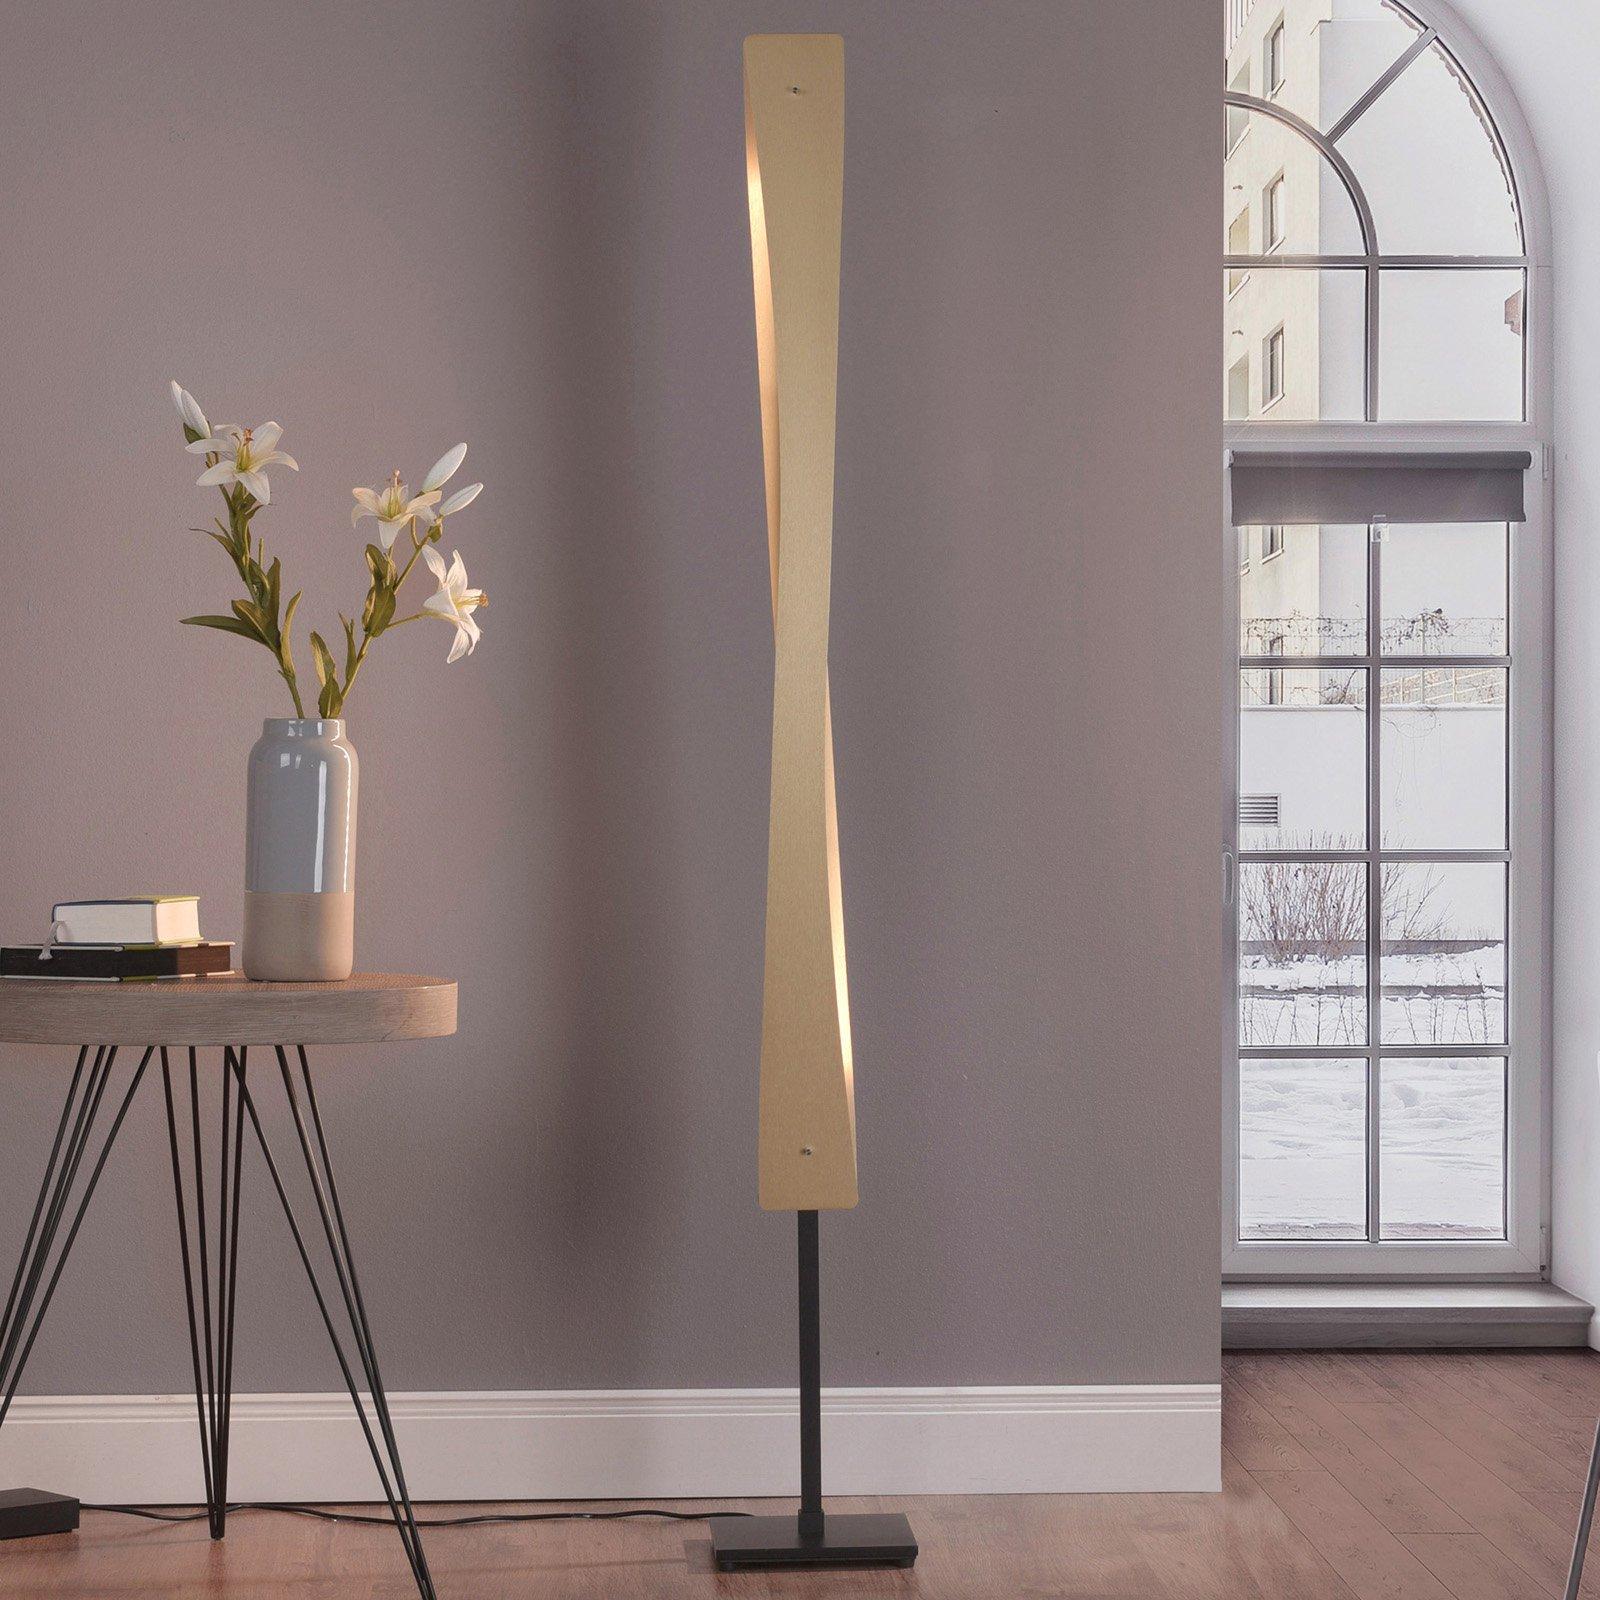 Lucande Lian LED-gulvlampe, messing, svart